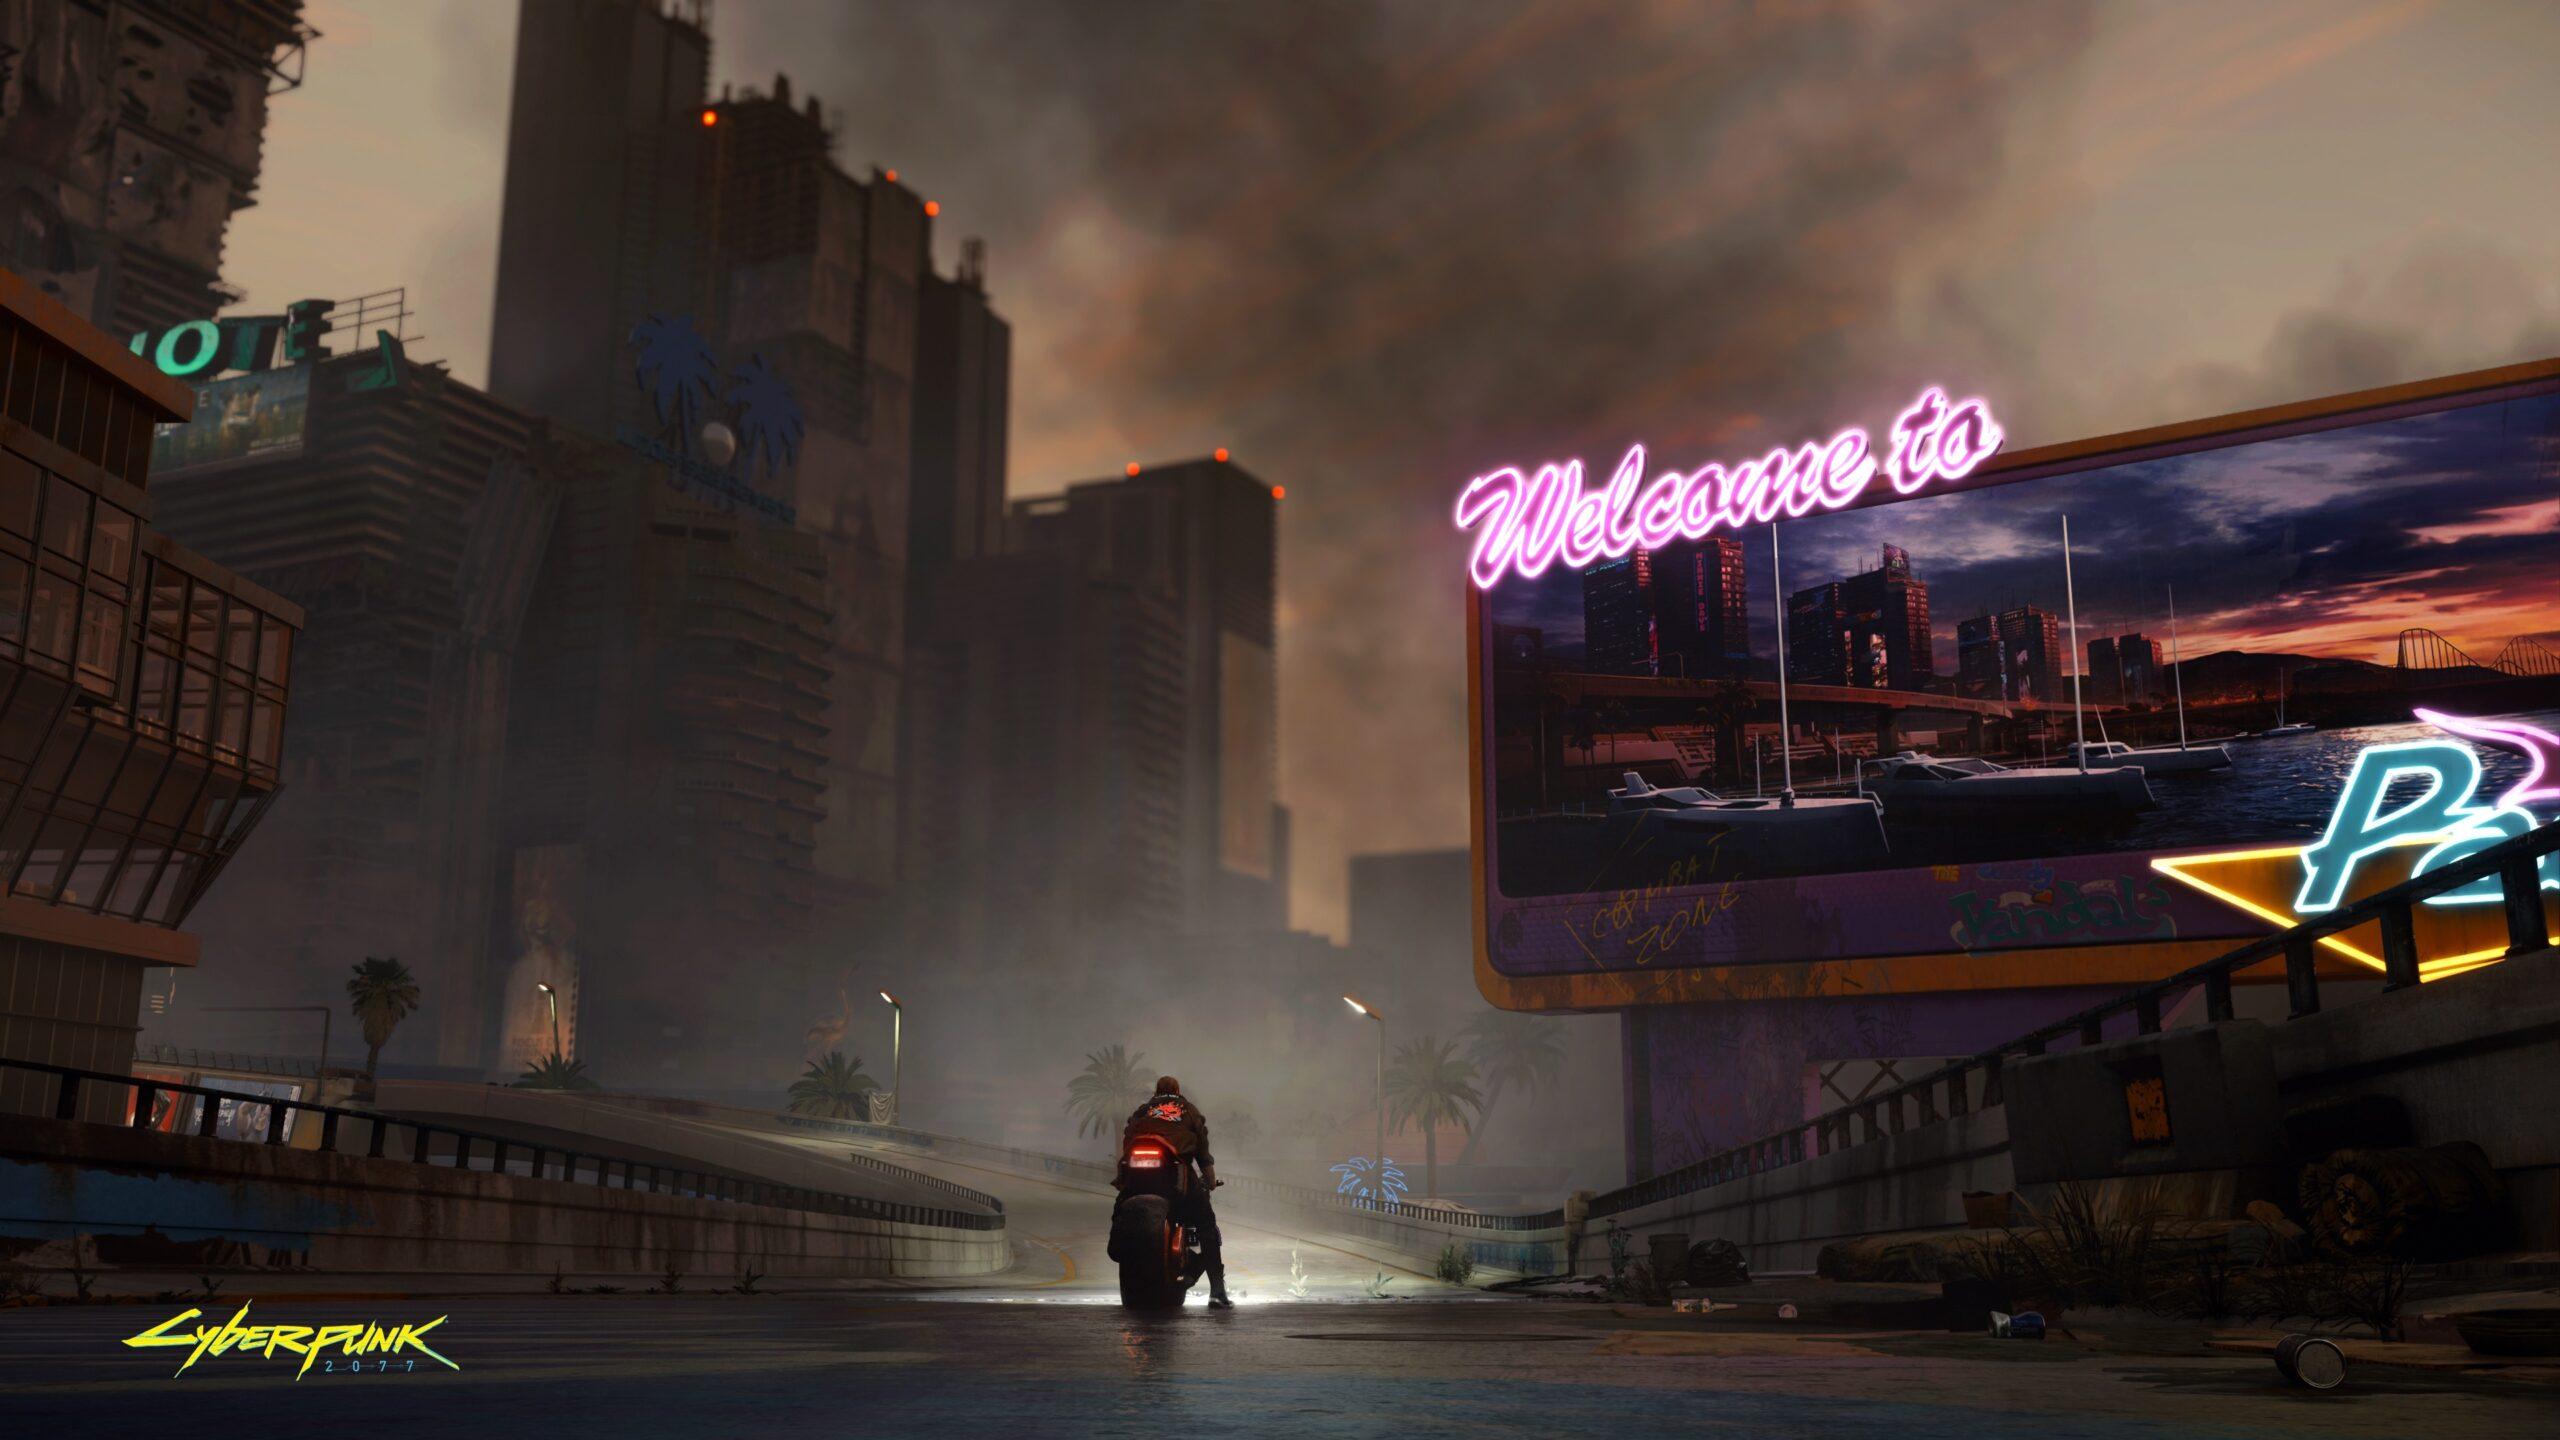 cyberpunk scenery